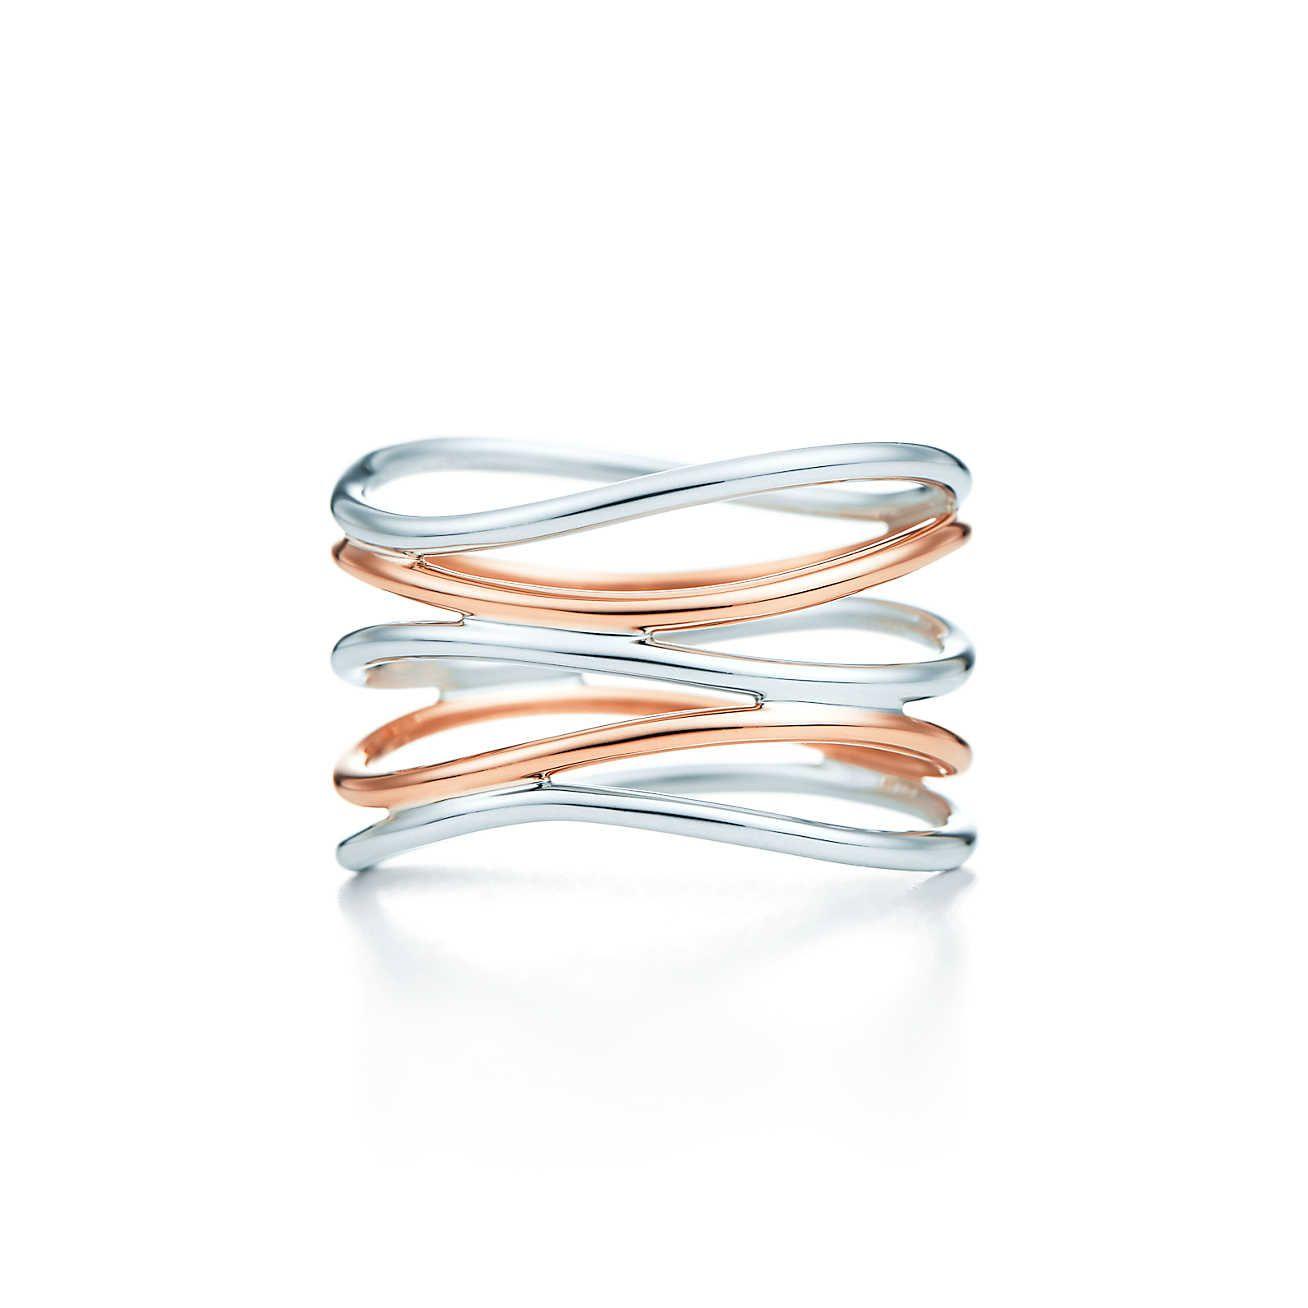 72e196461 Wave Five-row Ring | Accessories | Bling | Fashion, Elsa peretti ...